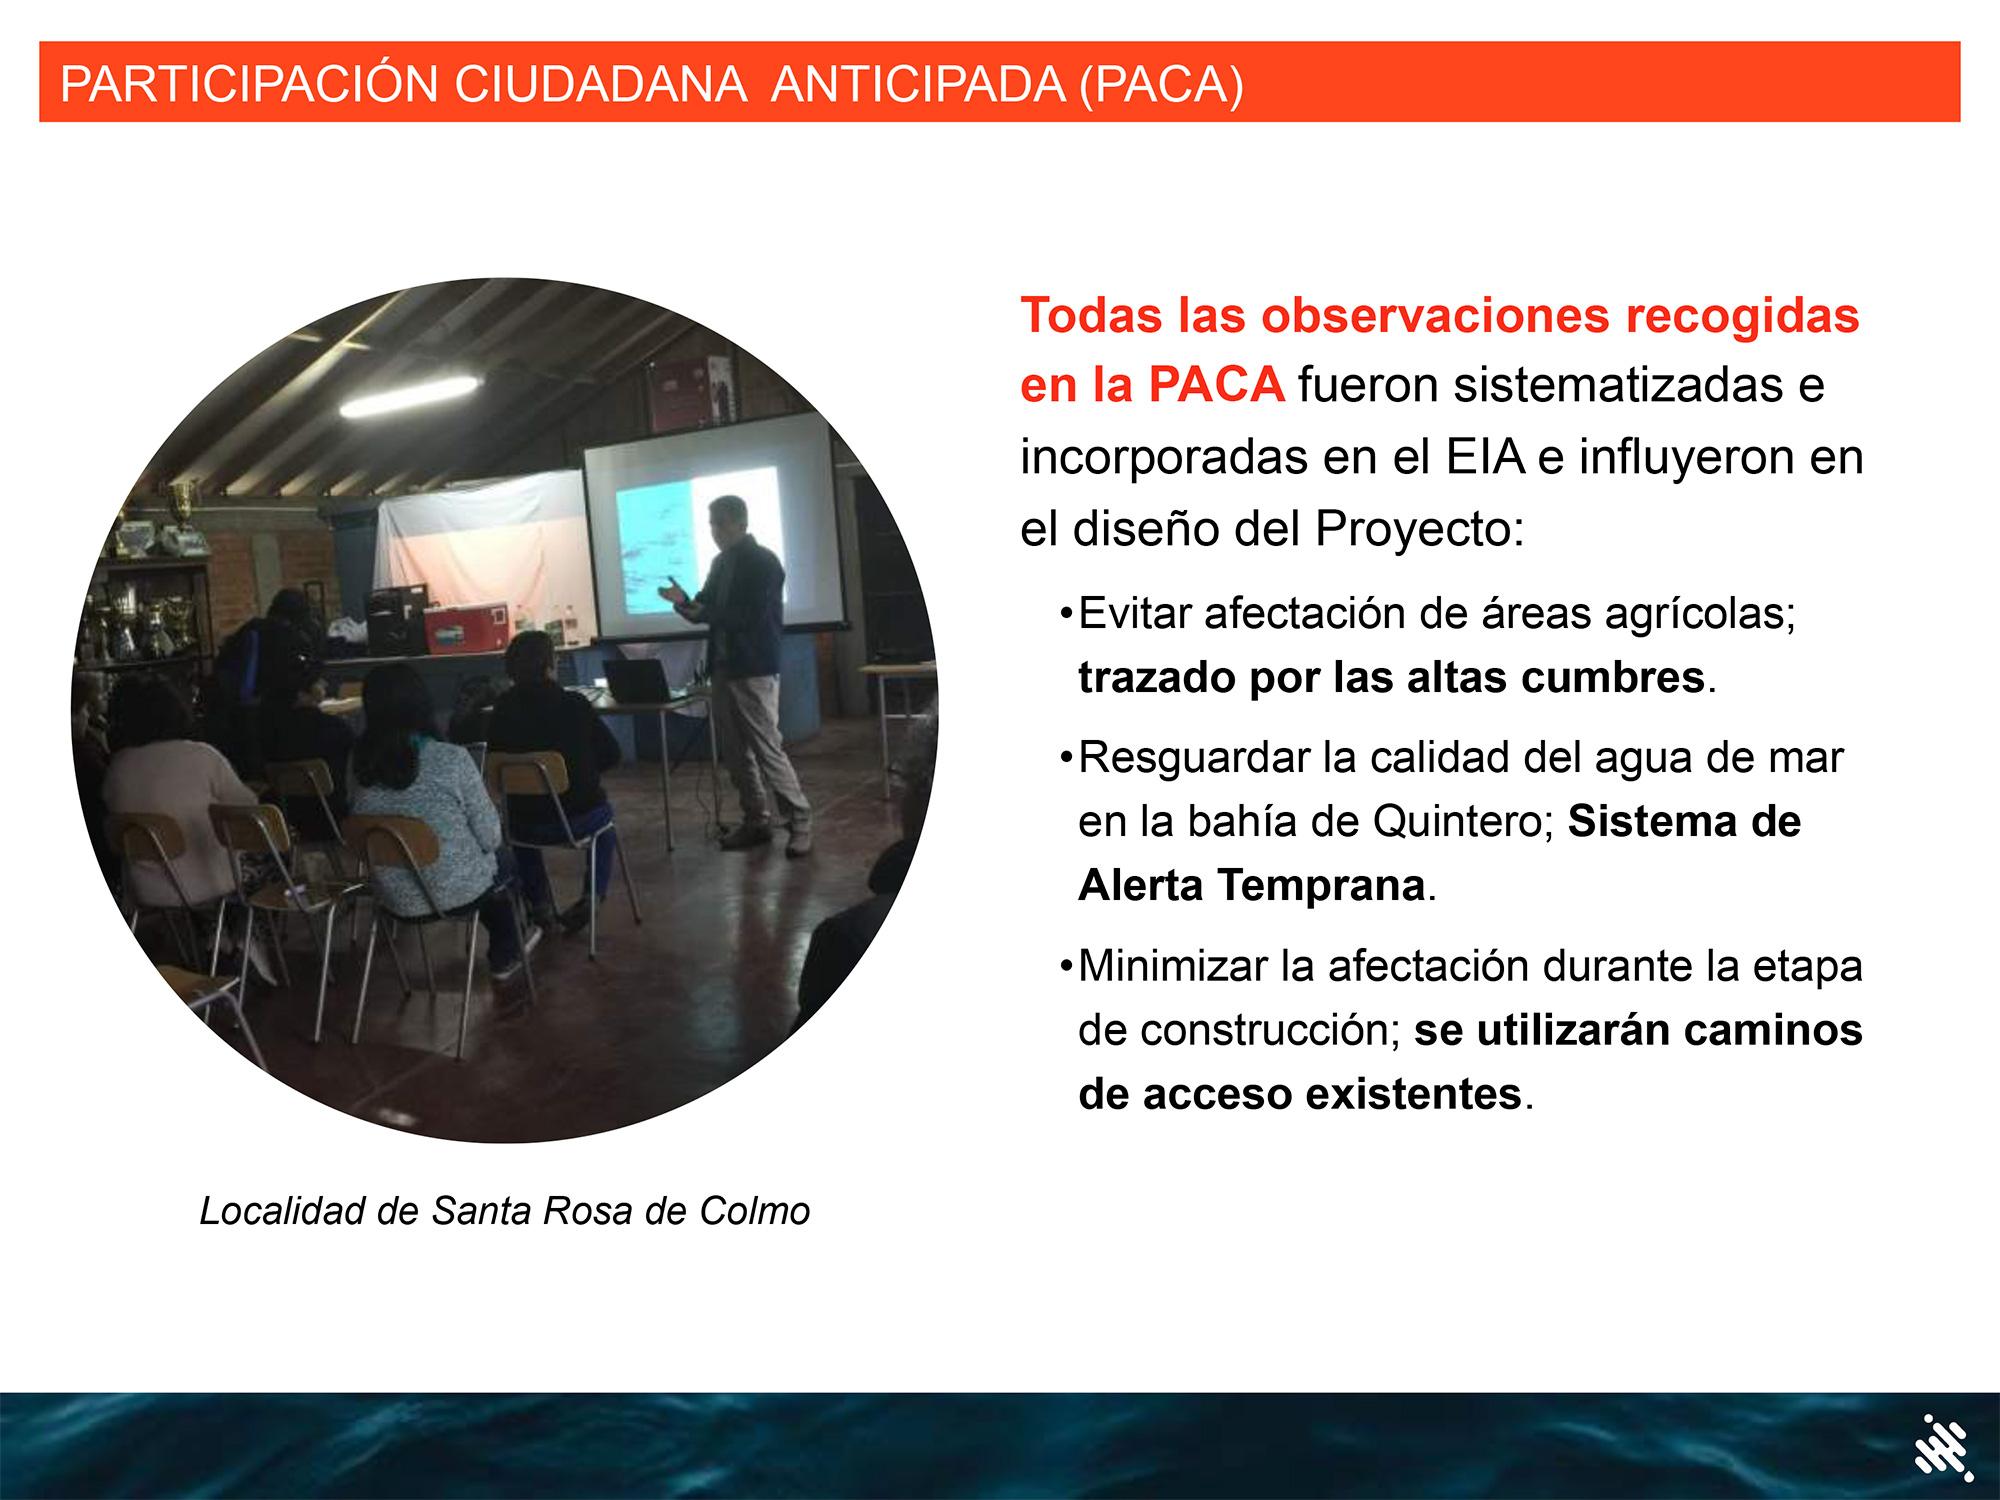 AP_Proyecto_Aconcagua-20.jpg